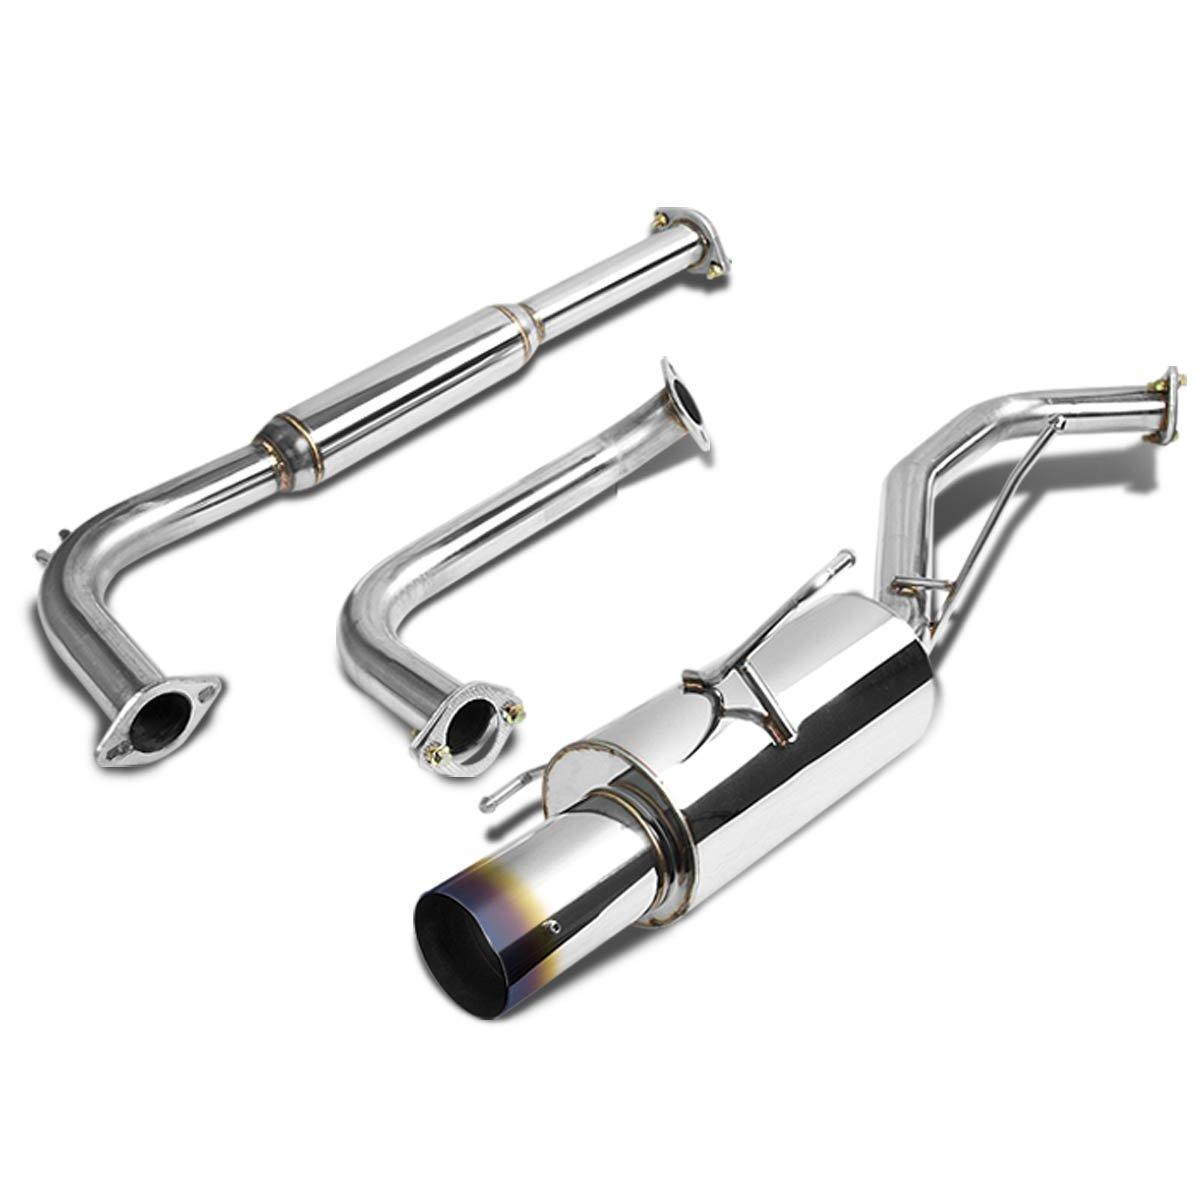 For Nissan Maxima Catback Exhaust System 4' Tip Muffler - A33 V6 Auto Dynasty